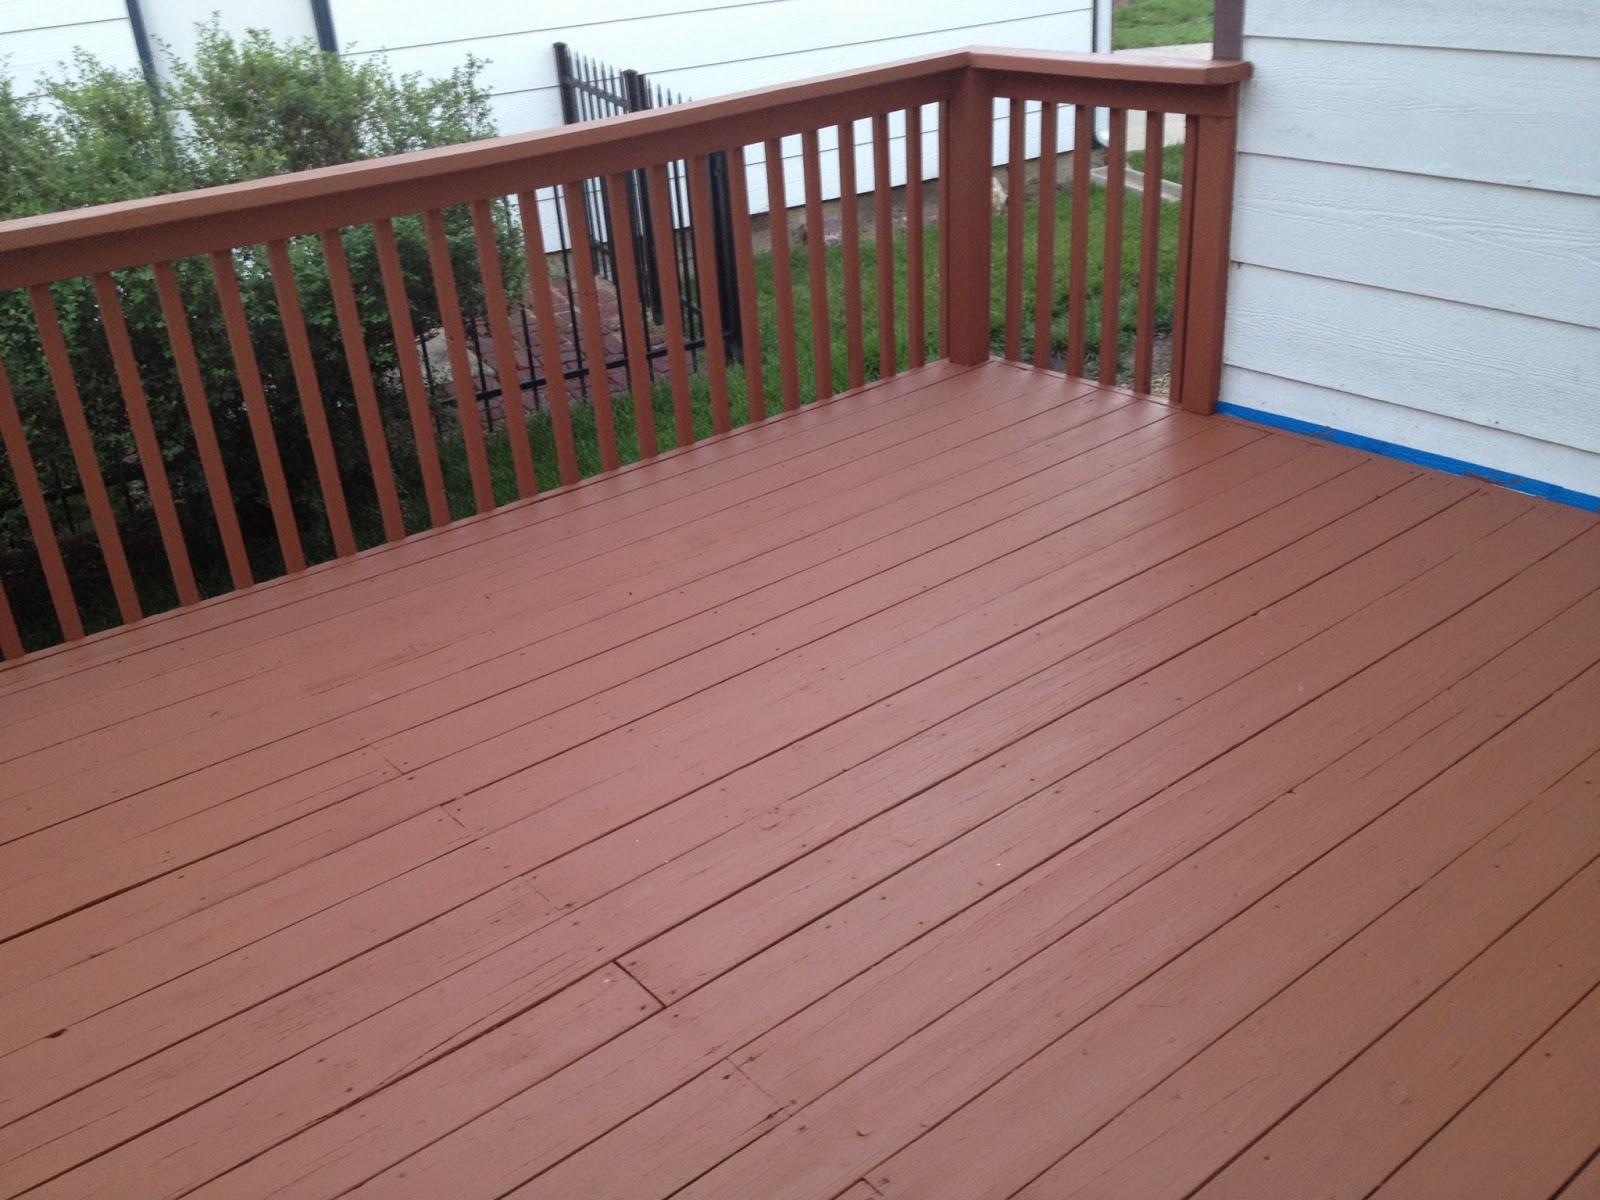 behr deck stain review behr s premium semi transparent wood stain 1600x1200